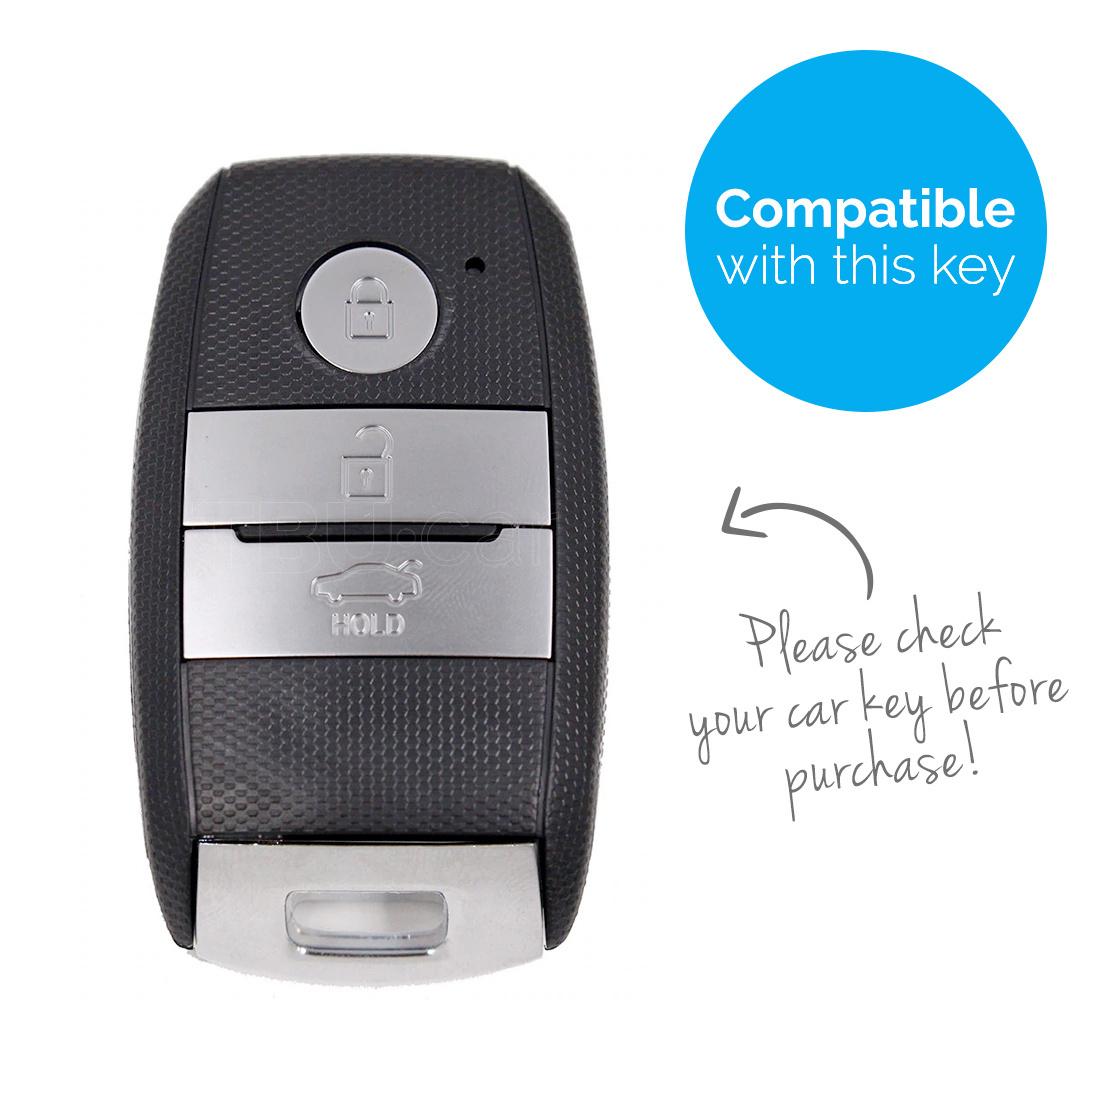 TBU car TBU car Sleutel cover compatibel met Kia - TPU sleutel hoesje / beschermhoesje autosleutel - Roségoud